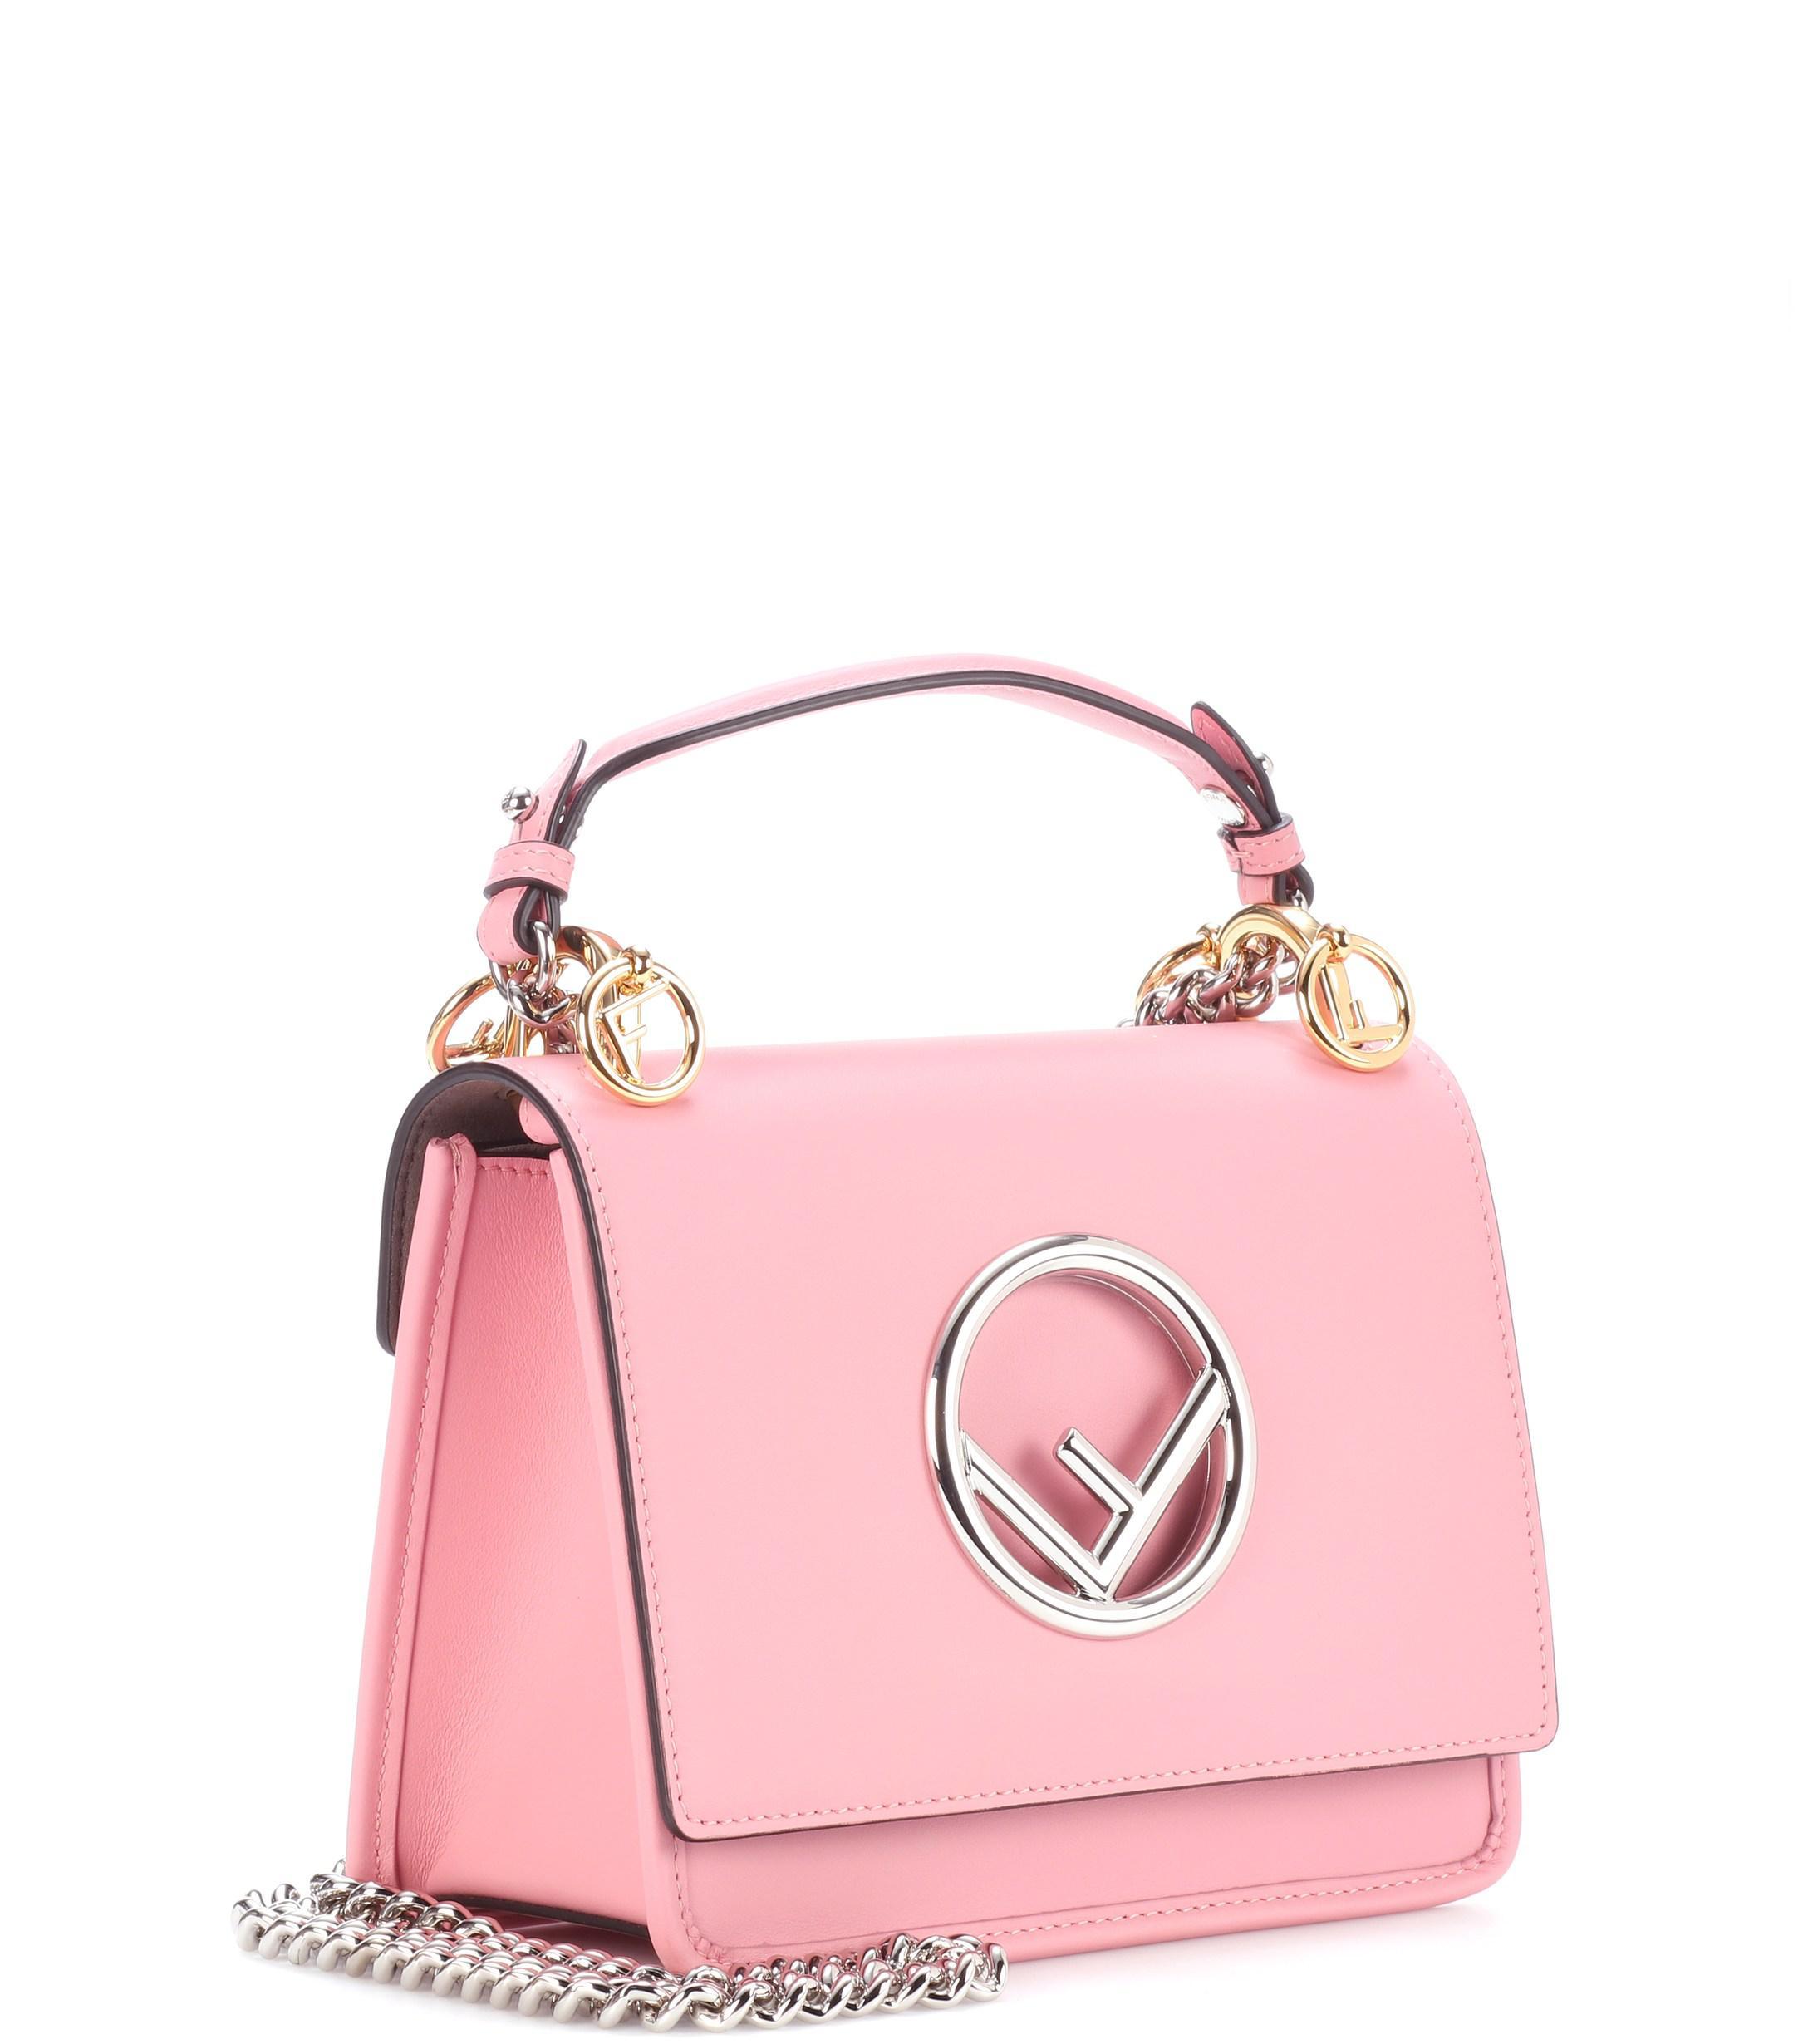 Lyst - Fendi Exclusive To Mytheresa.com – Kan I F Mini Leather ... 256be11f2ad97